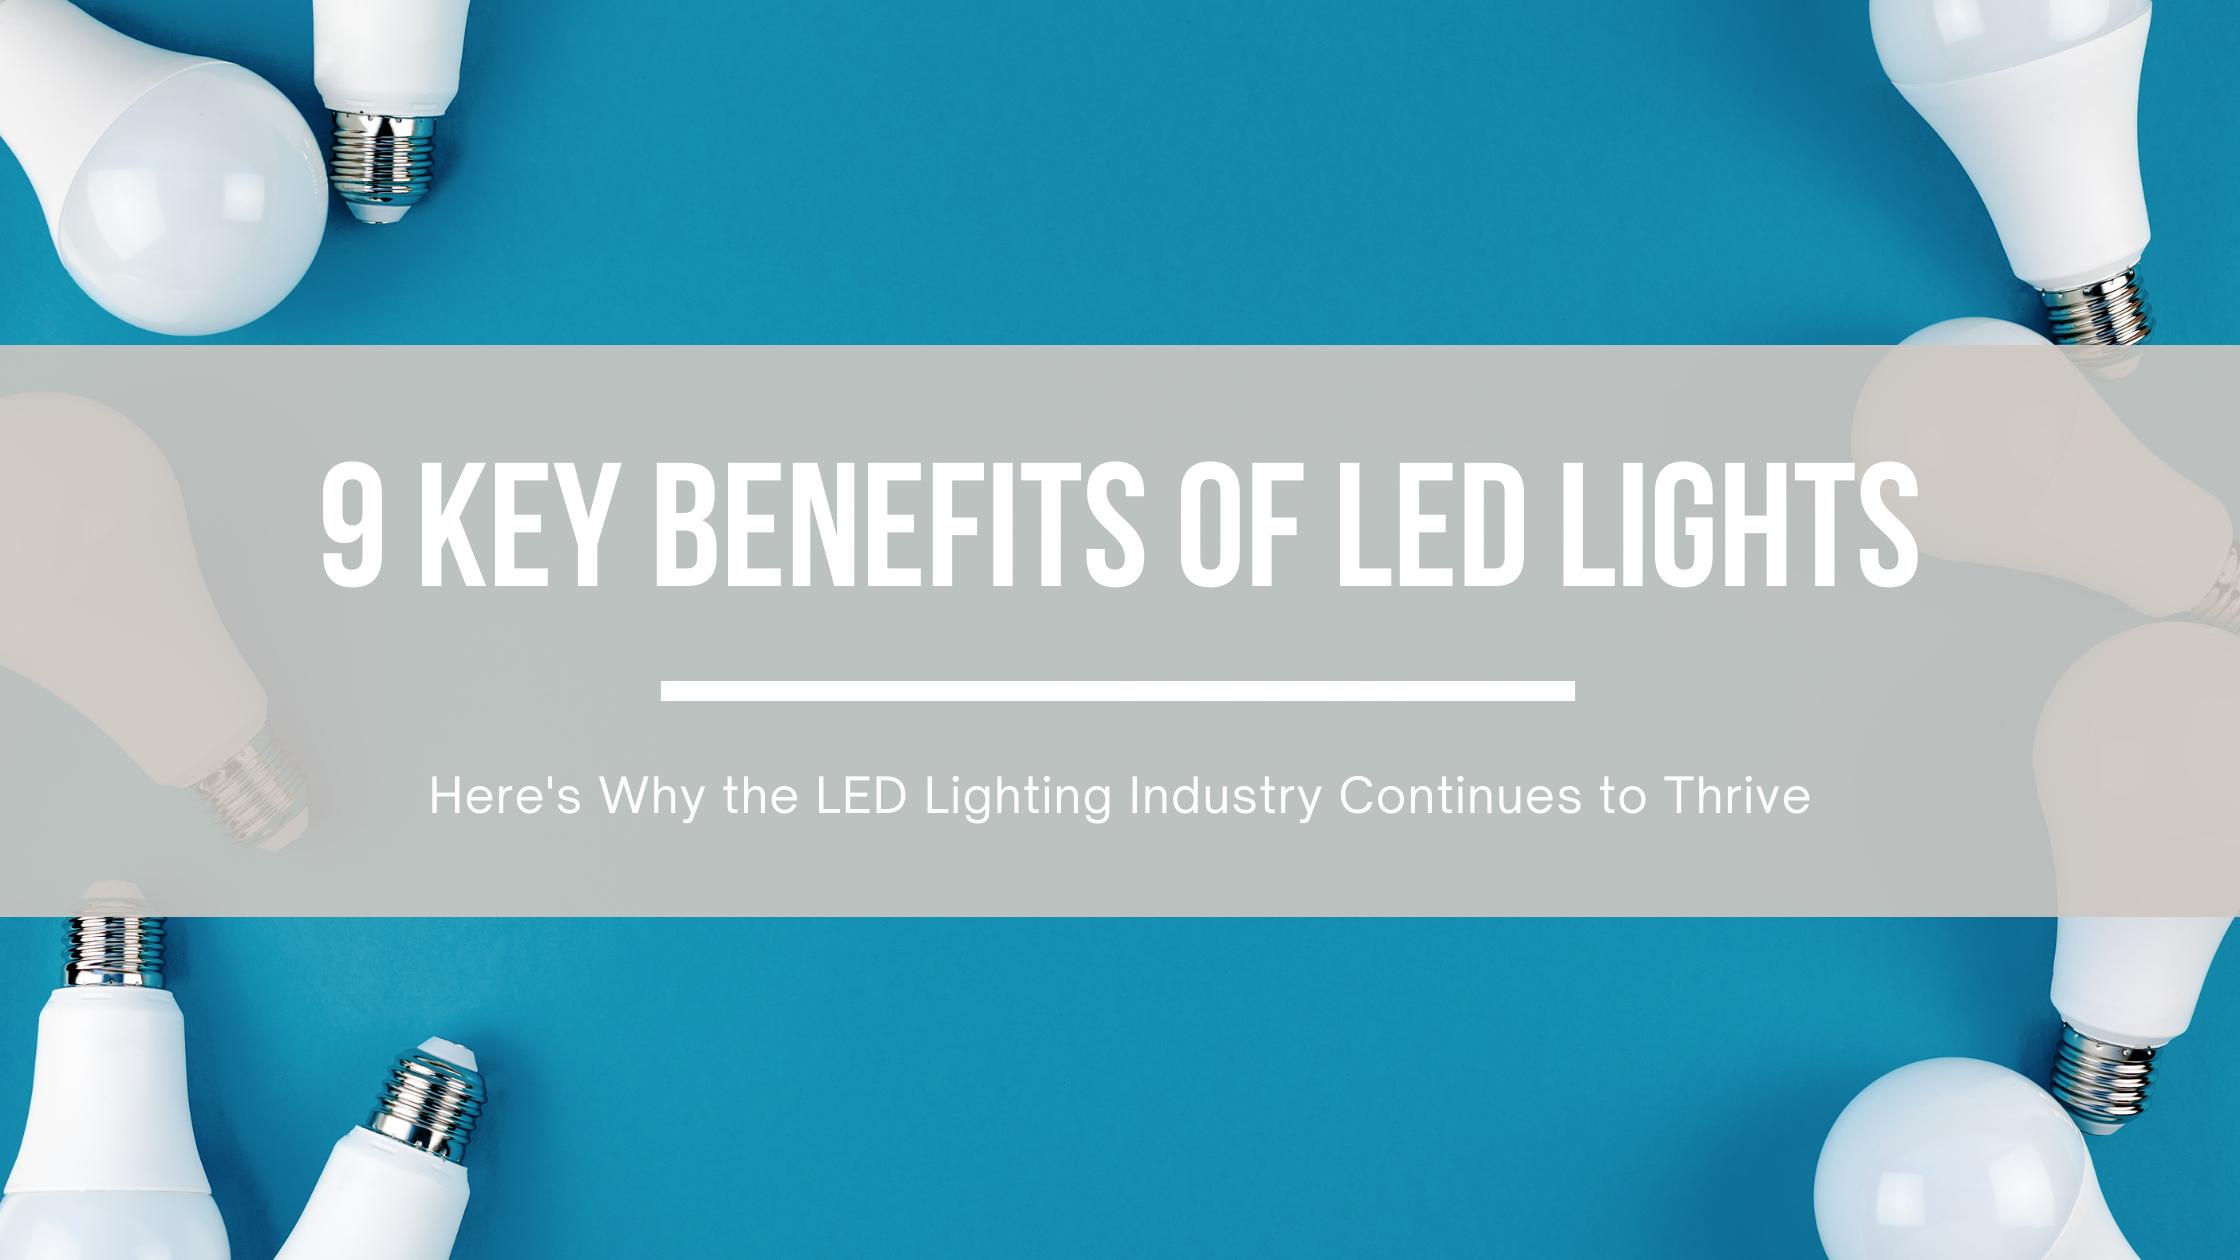 9 Key Benefits of LED Lights